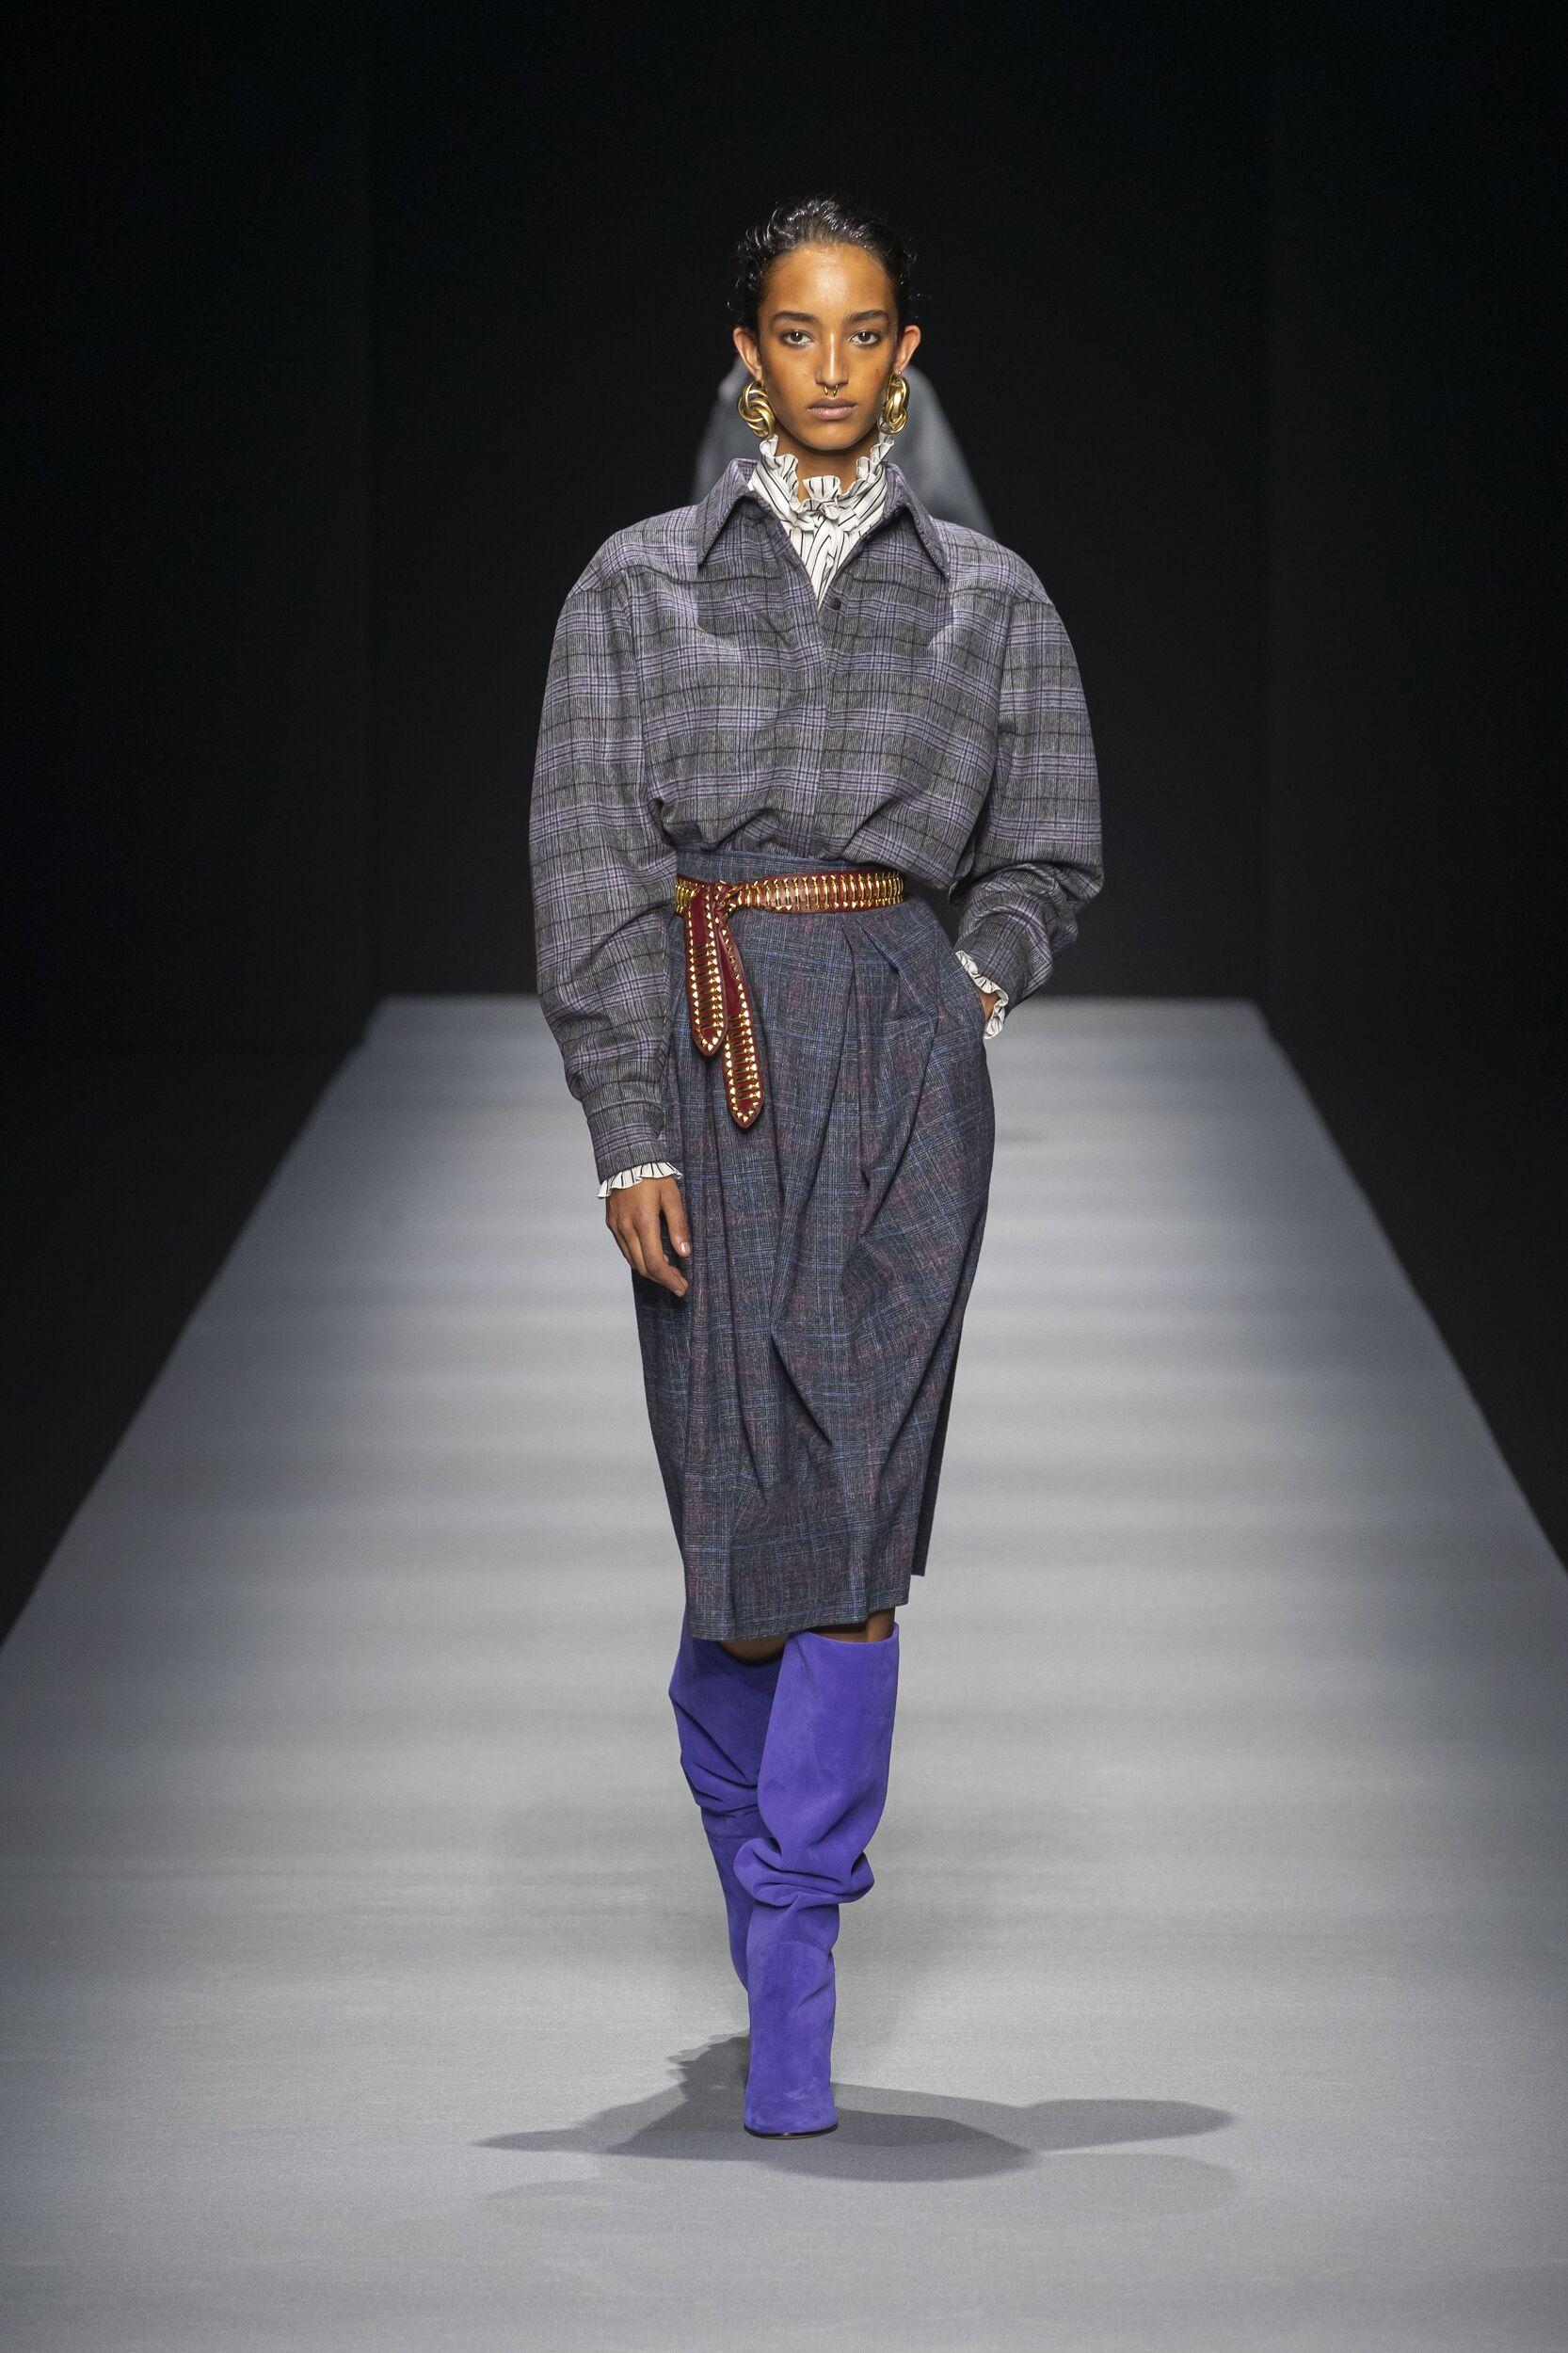 Alberta Ferretti FW 2020 Womenswear